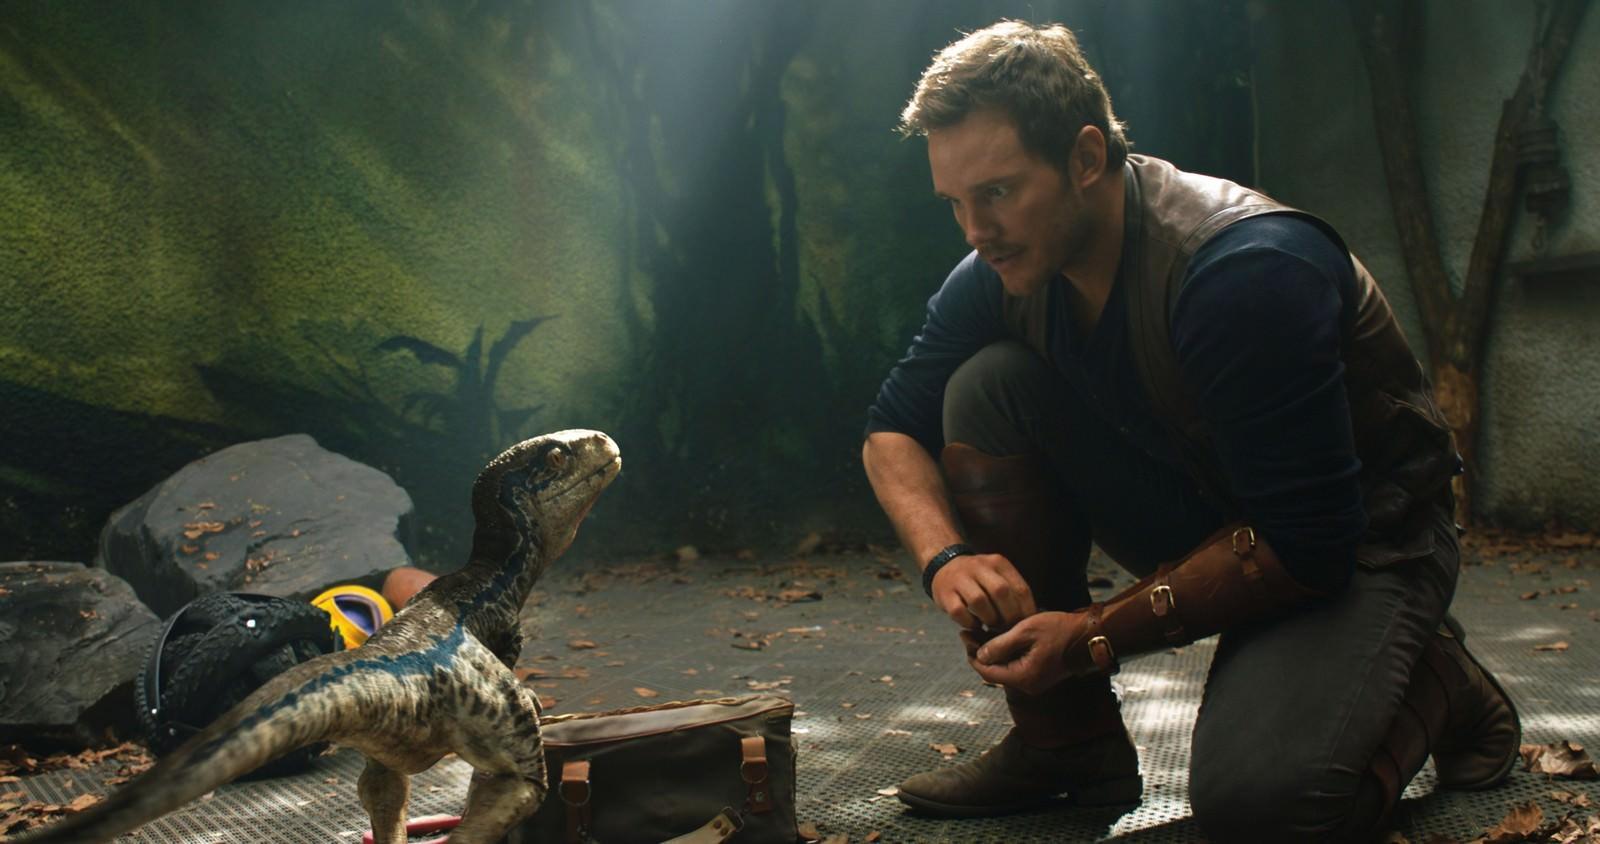 Movie, Jurassic World: Fallen Kingdom(美國) / 侏羅紀世界:殞落國度(台) / 侏罗纪世界2(中) / 侏羅紀世界:迷失國度(港), 電影劇照